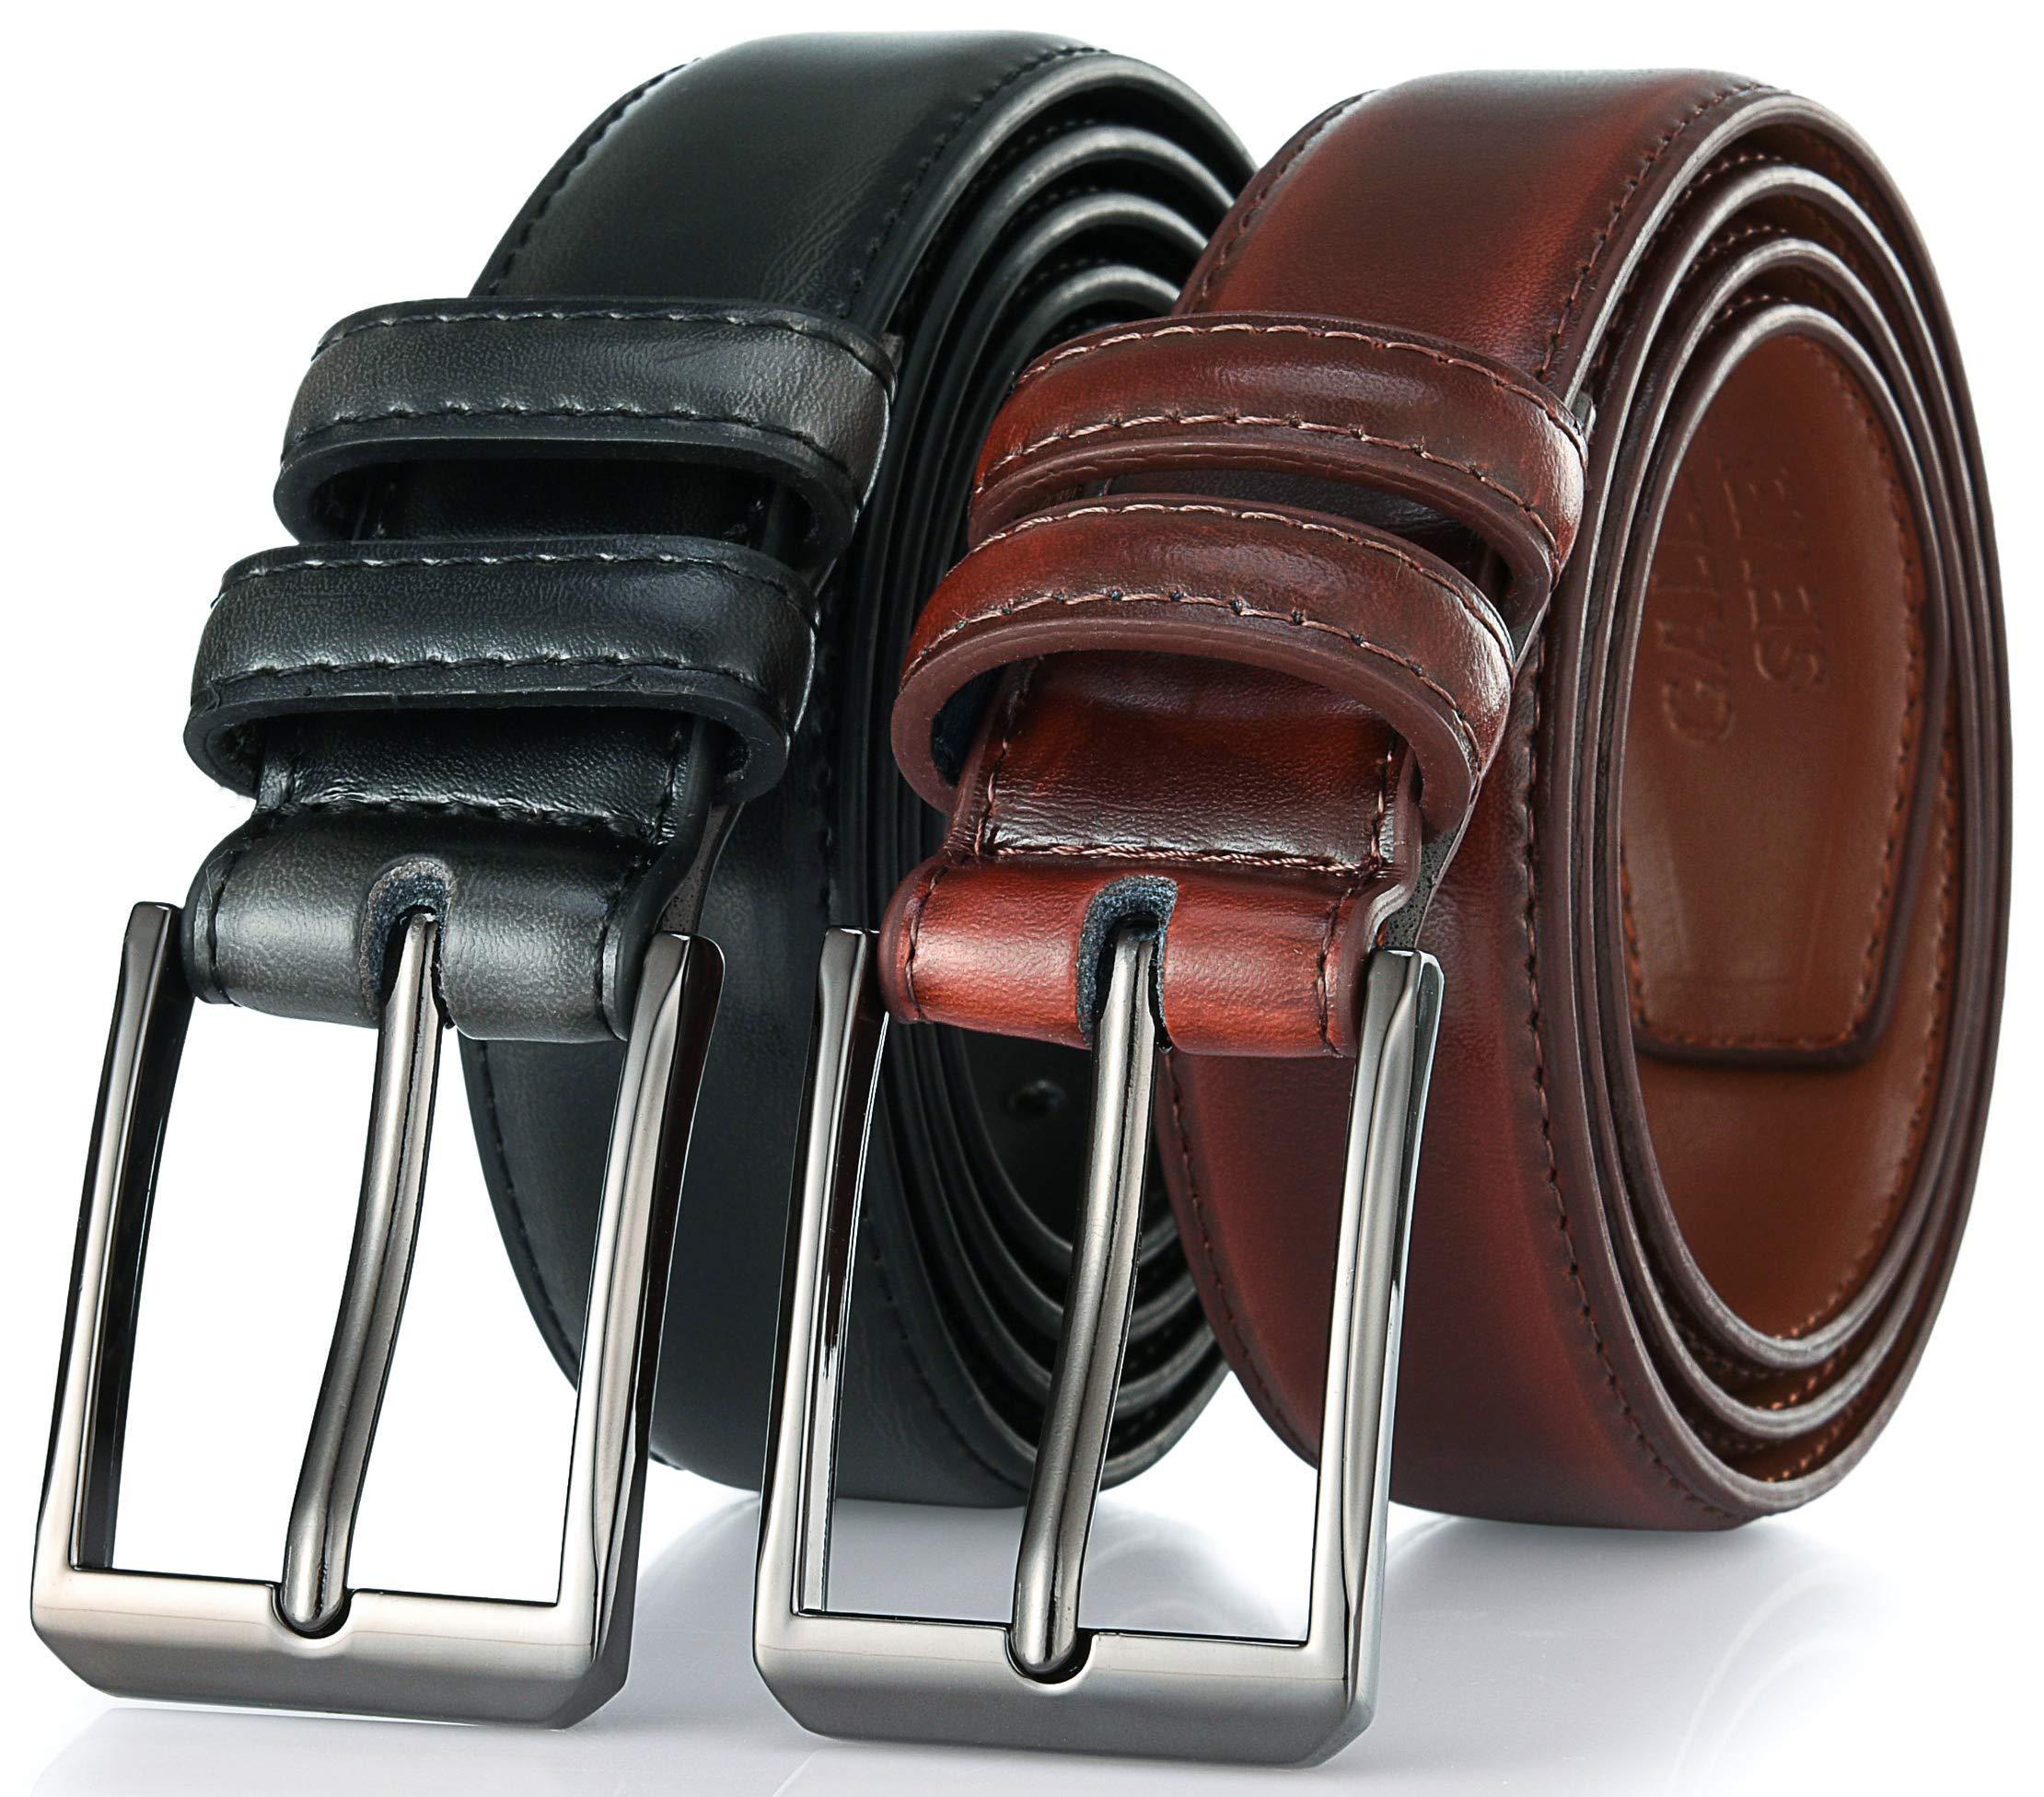 Gallery Seven Mens belt - Genuine Leather Dress Belt - Classic Casual Belt in gift box - 2 Pack - Mahagony & Black - Size 36 (Waist: 34)